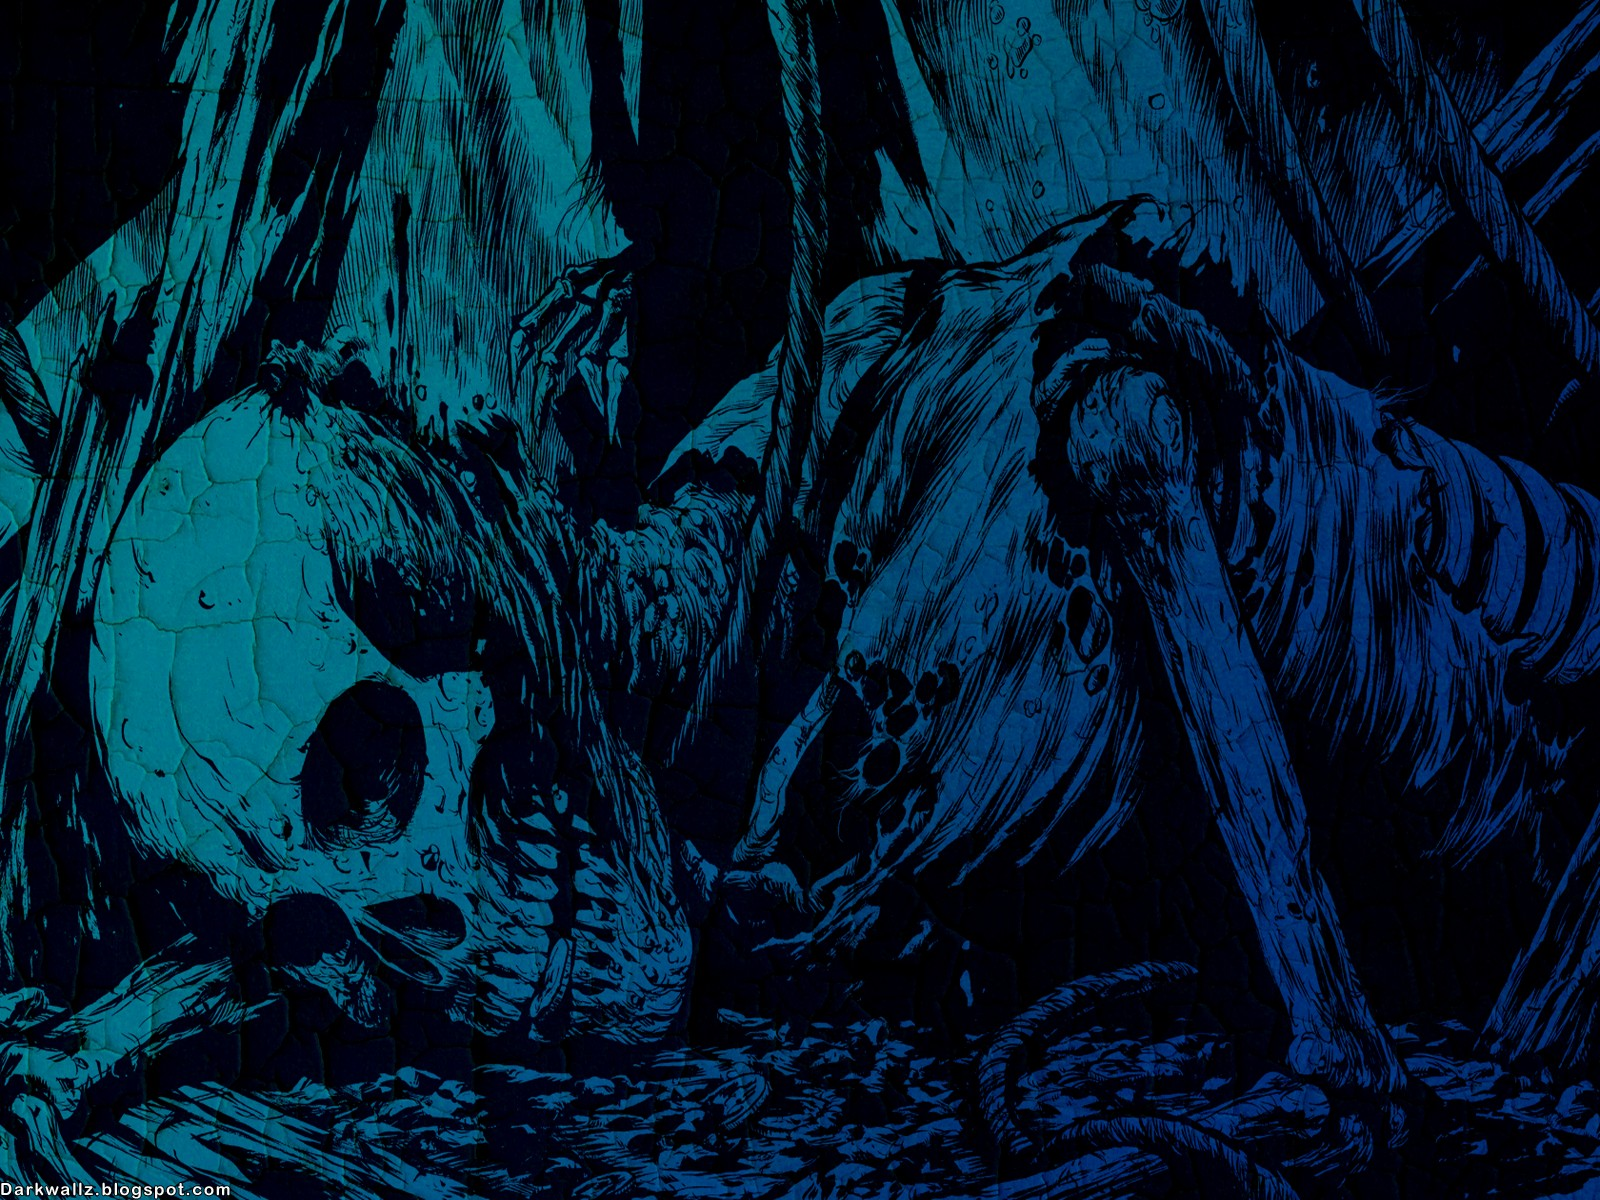 Cool D Flaming Skull Wallpapers Hd Wallpaper Full Pinterest 1600x1200